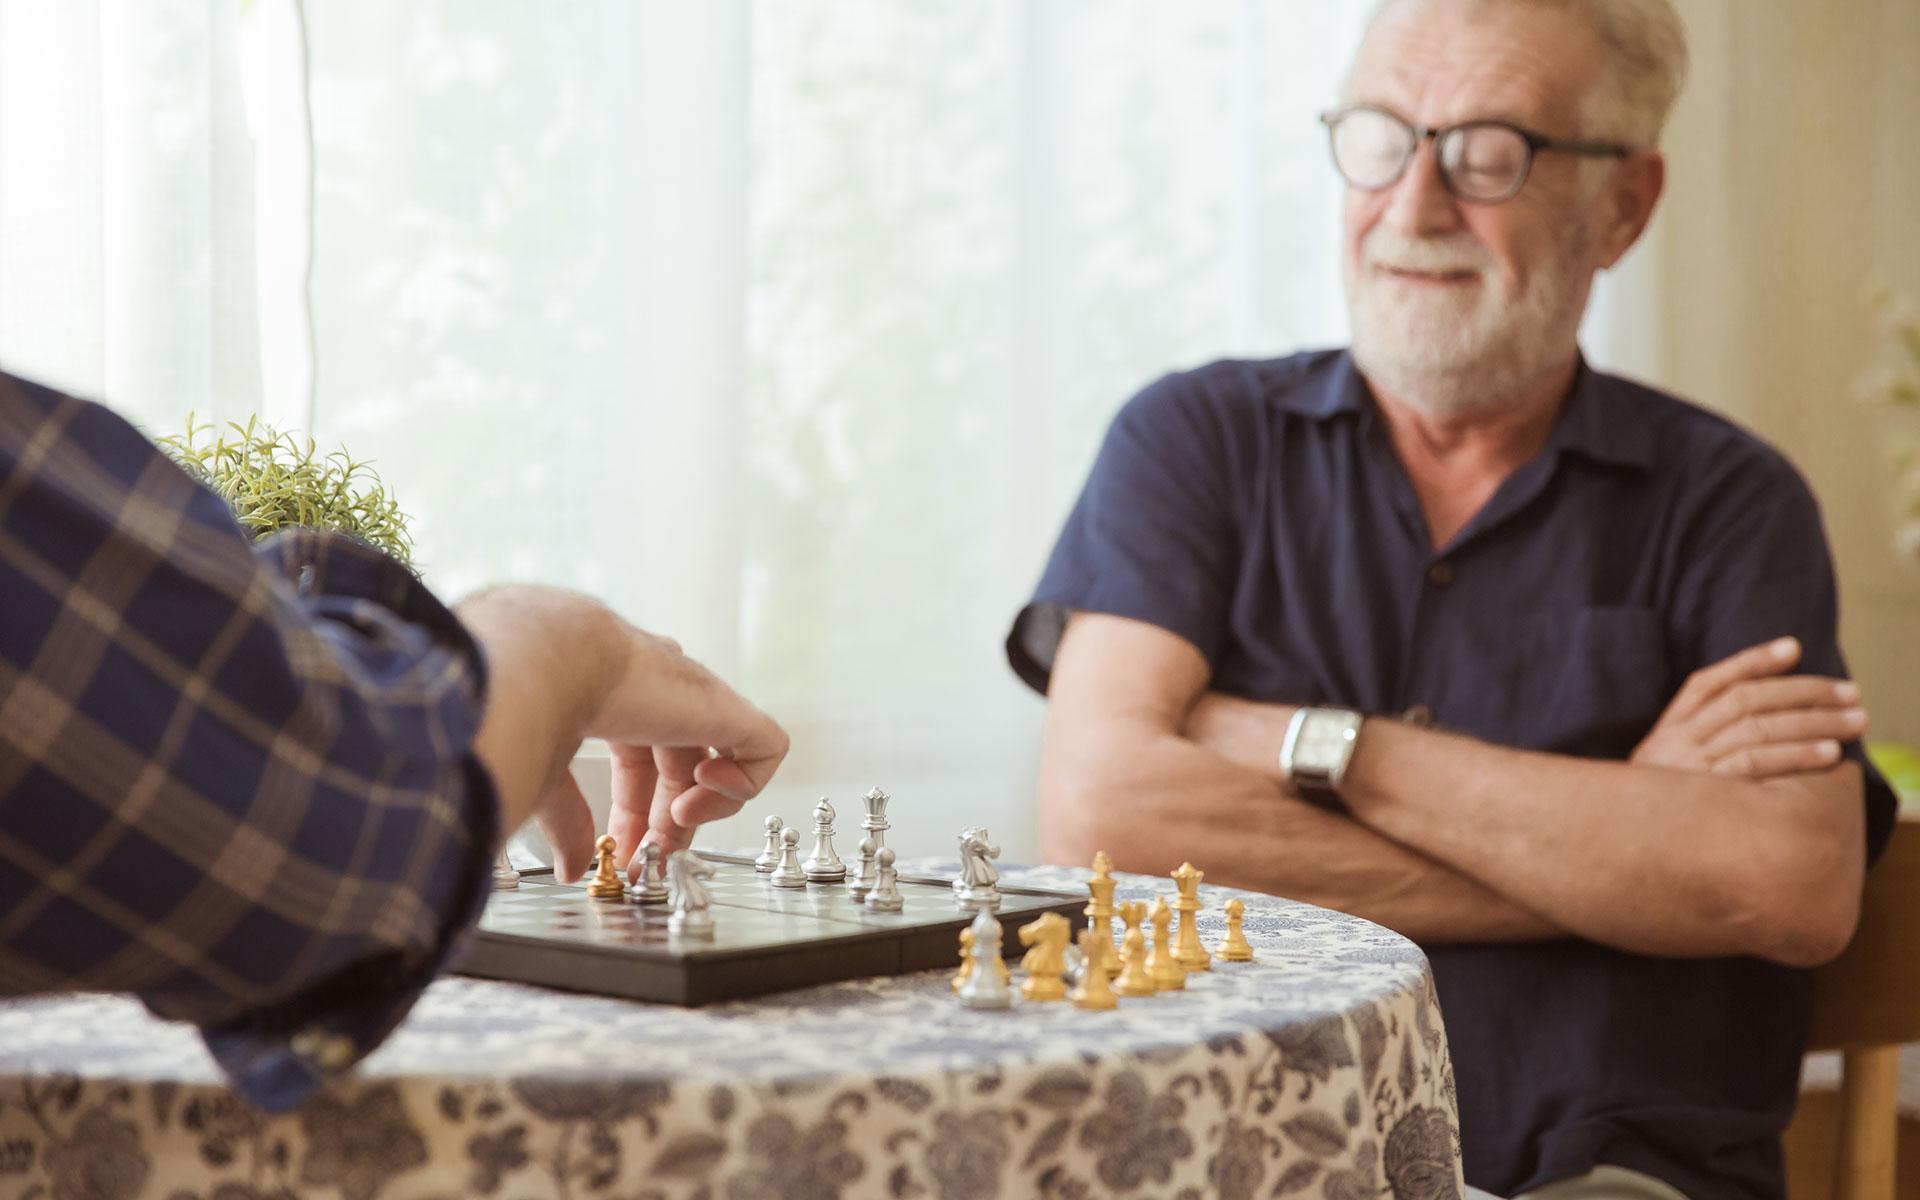 Elderly man enjoying a game of chess